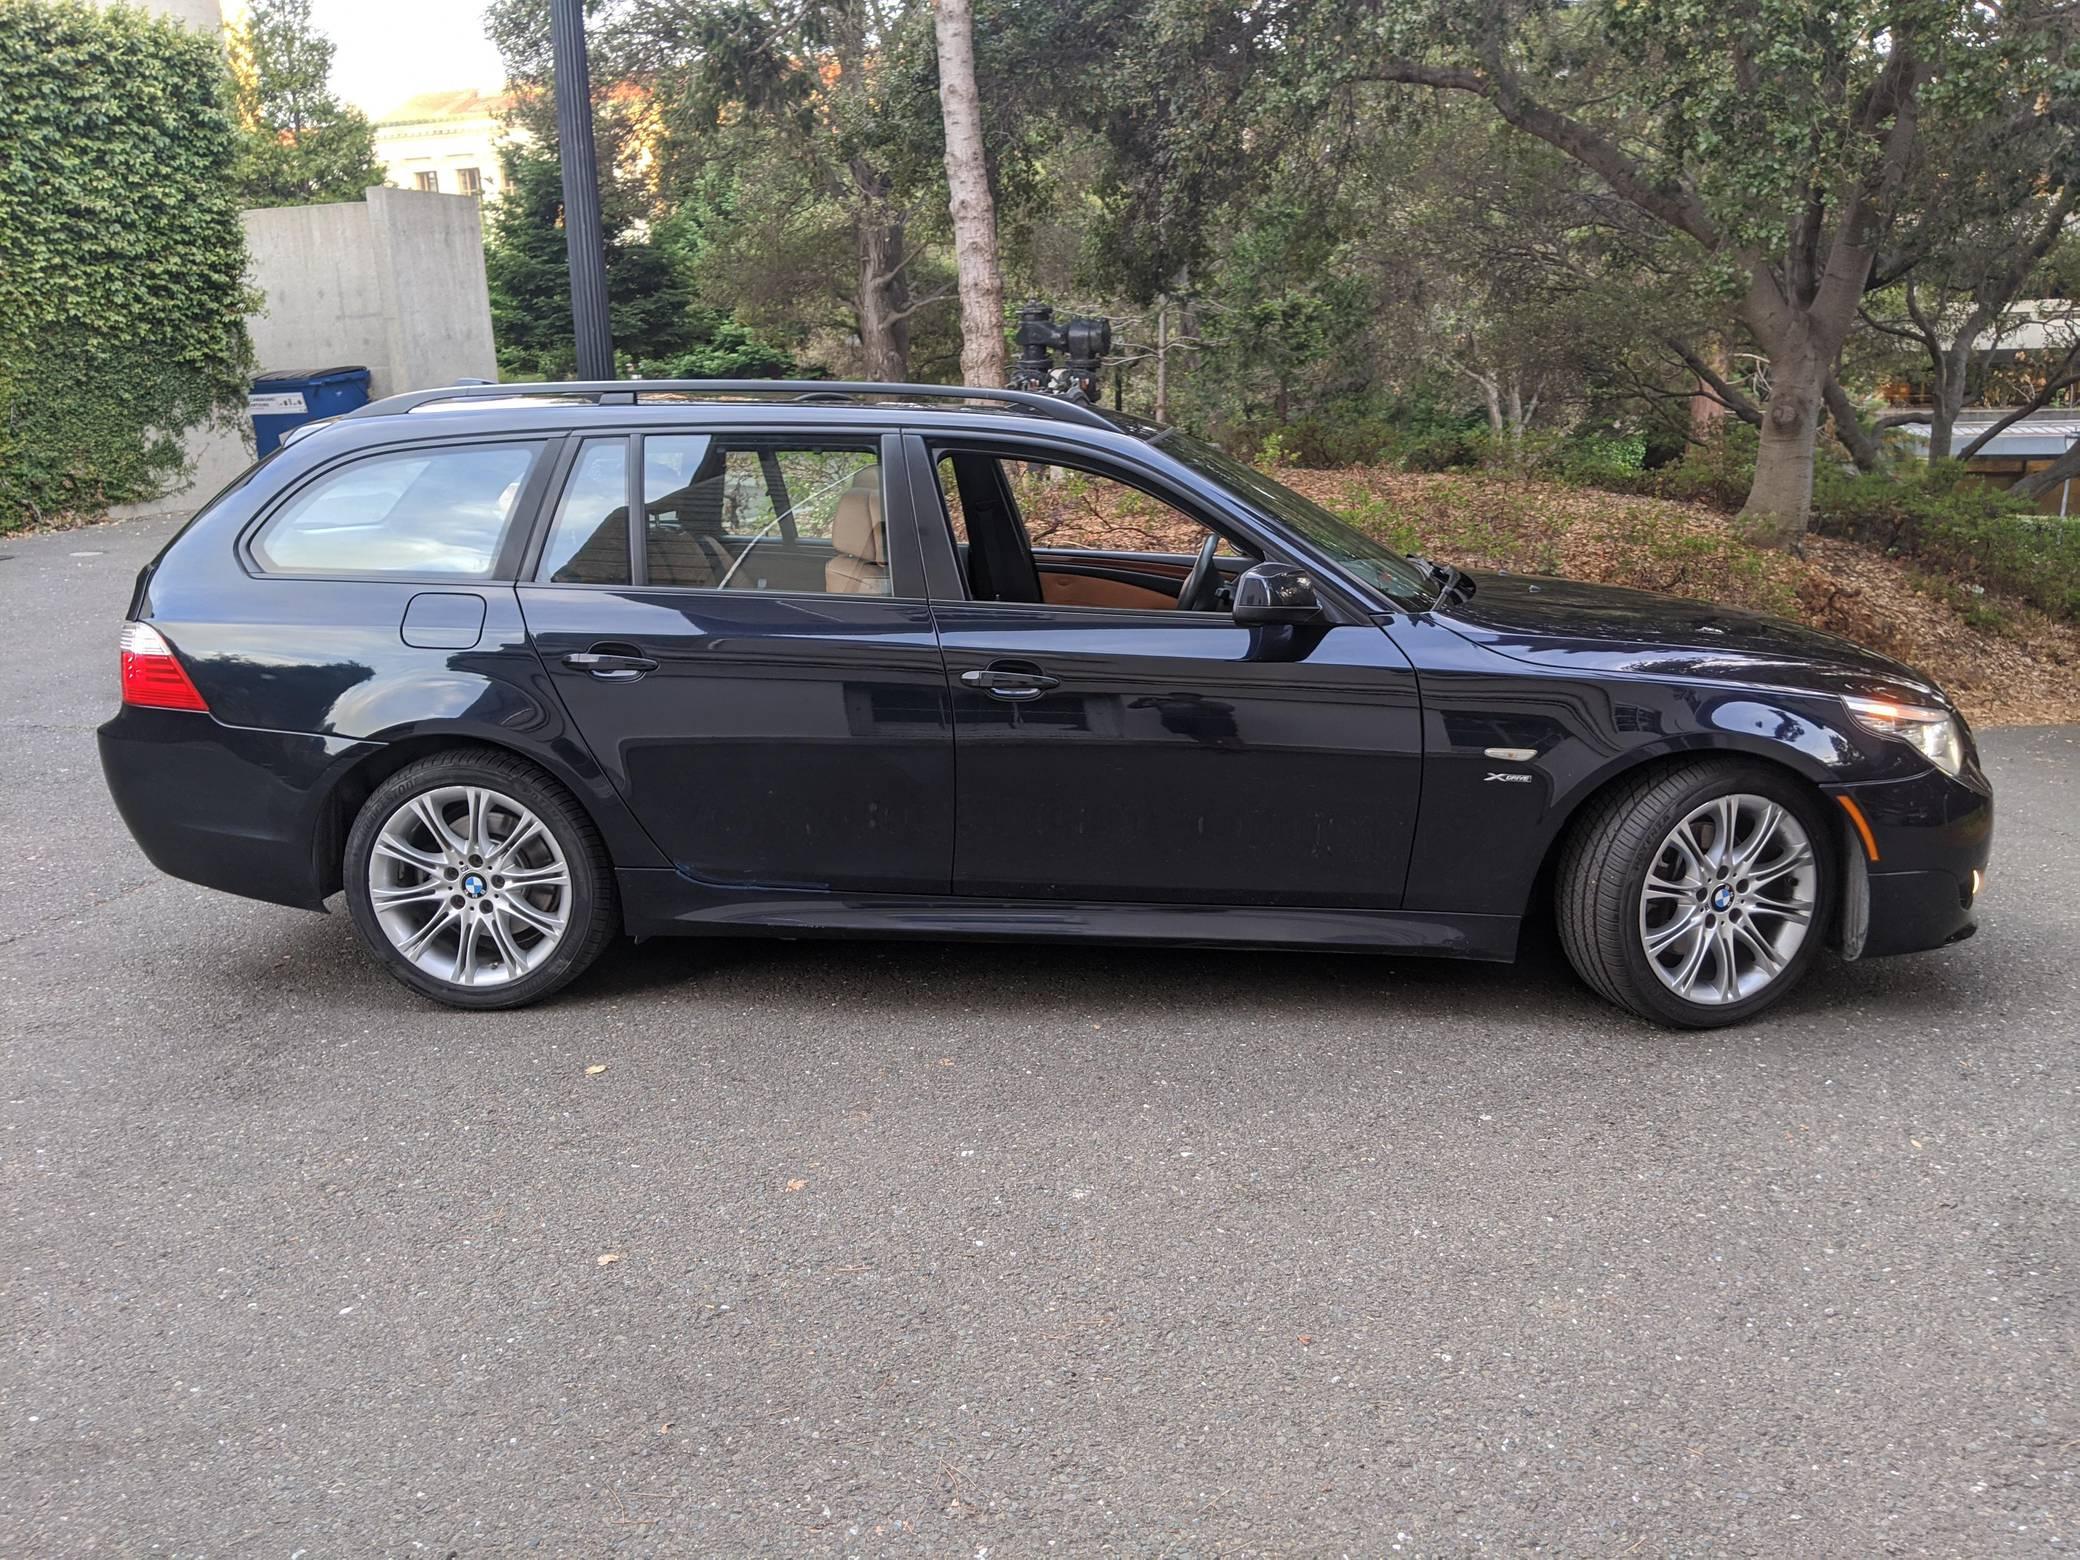 2010 Bmw 535i Xdrive Sports Wagon Auction Cars Bids